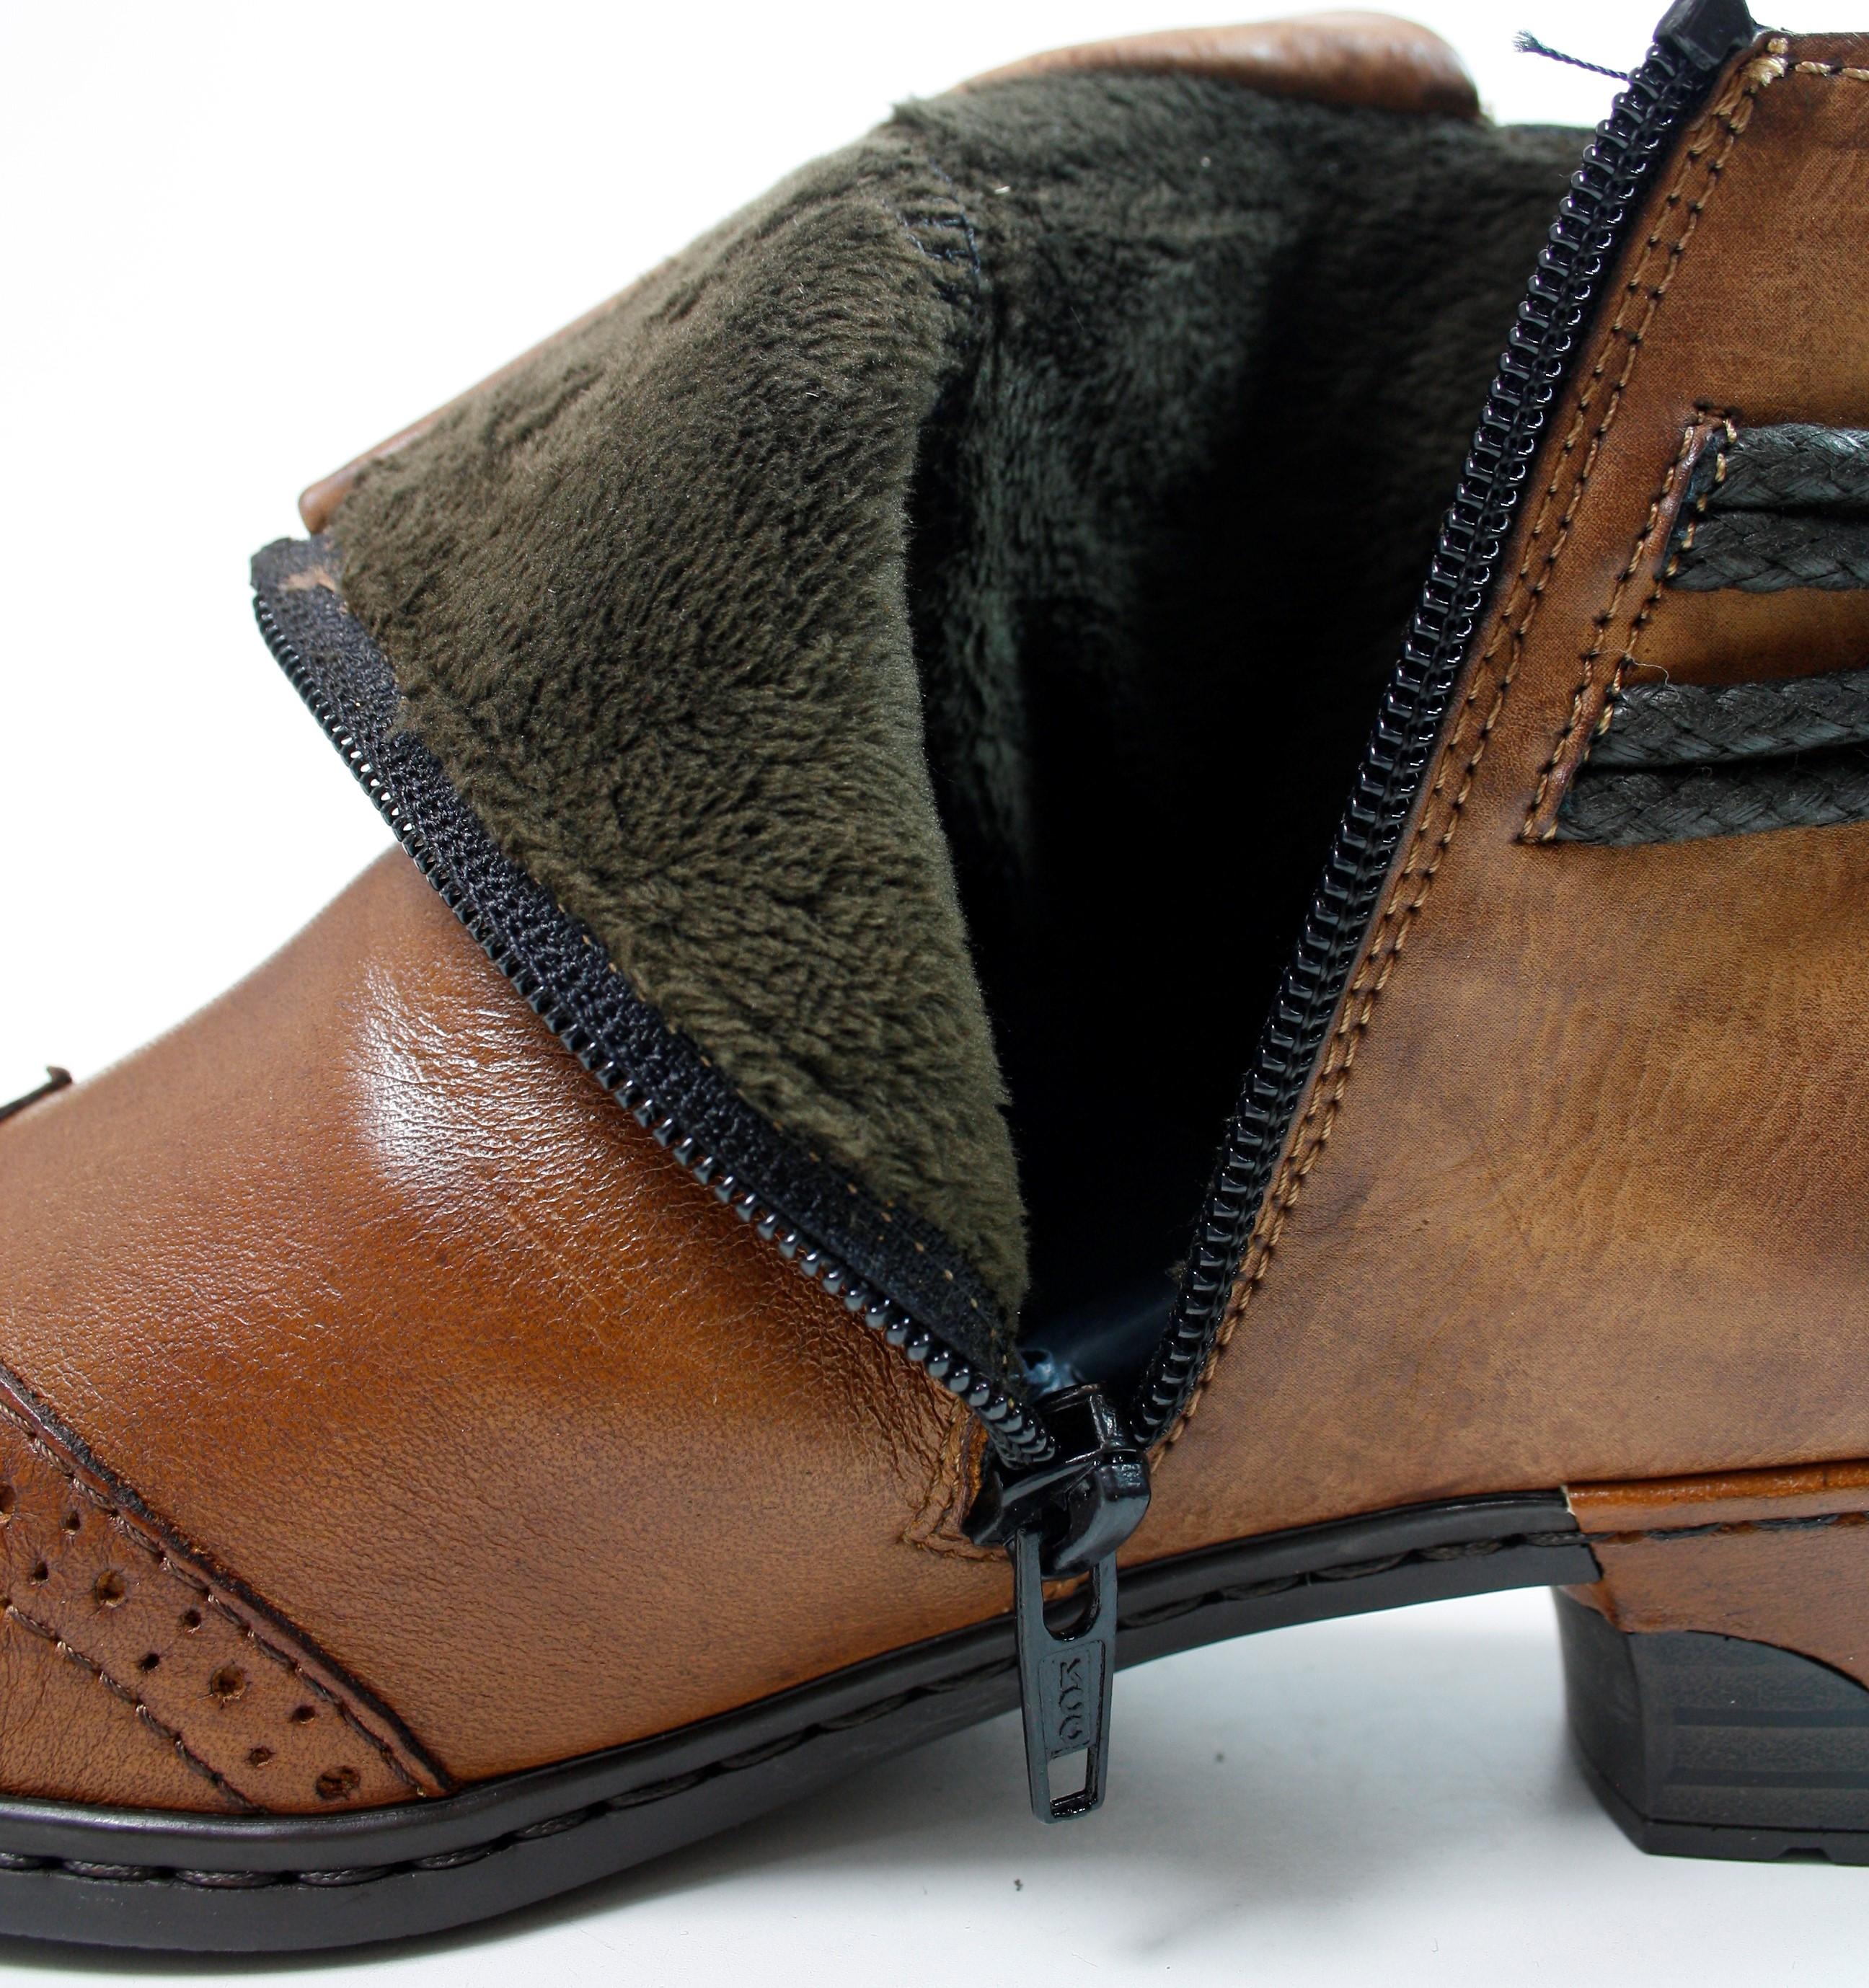 1a1c78e8731f7 RIEKER LADIES BROWN ANKLE BOOTS - 121 Shoes